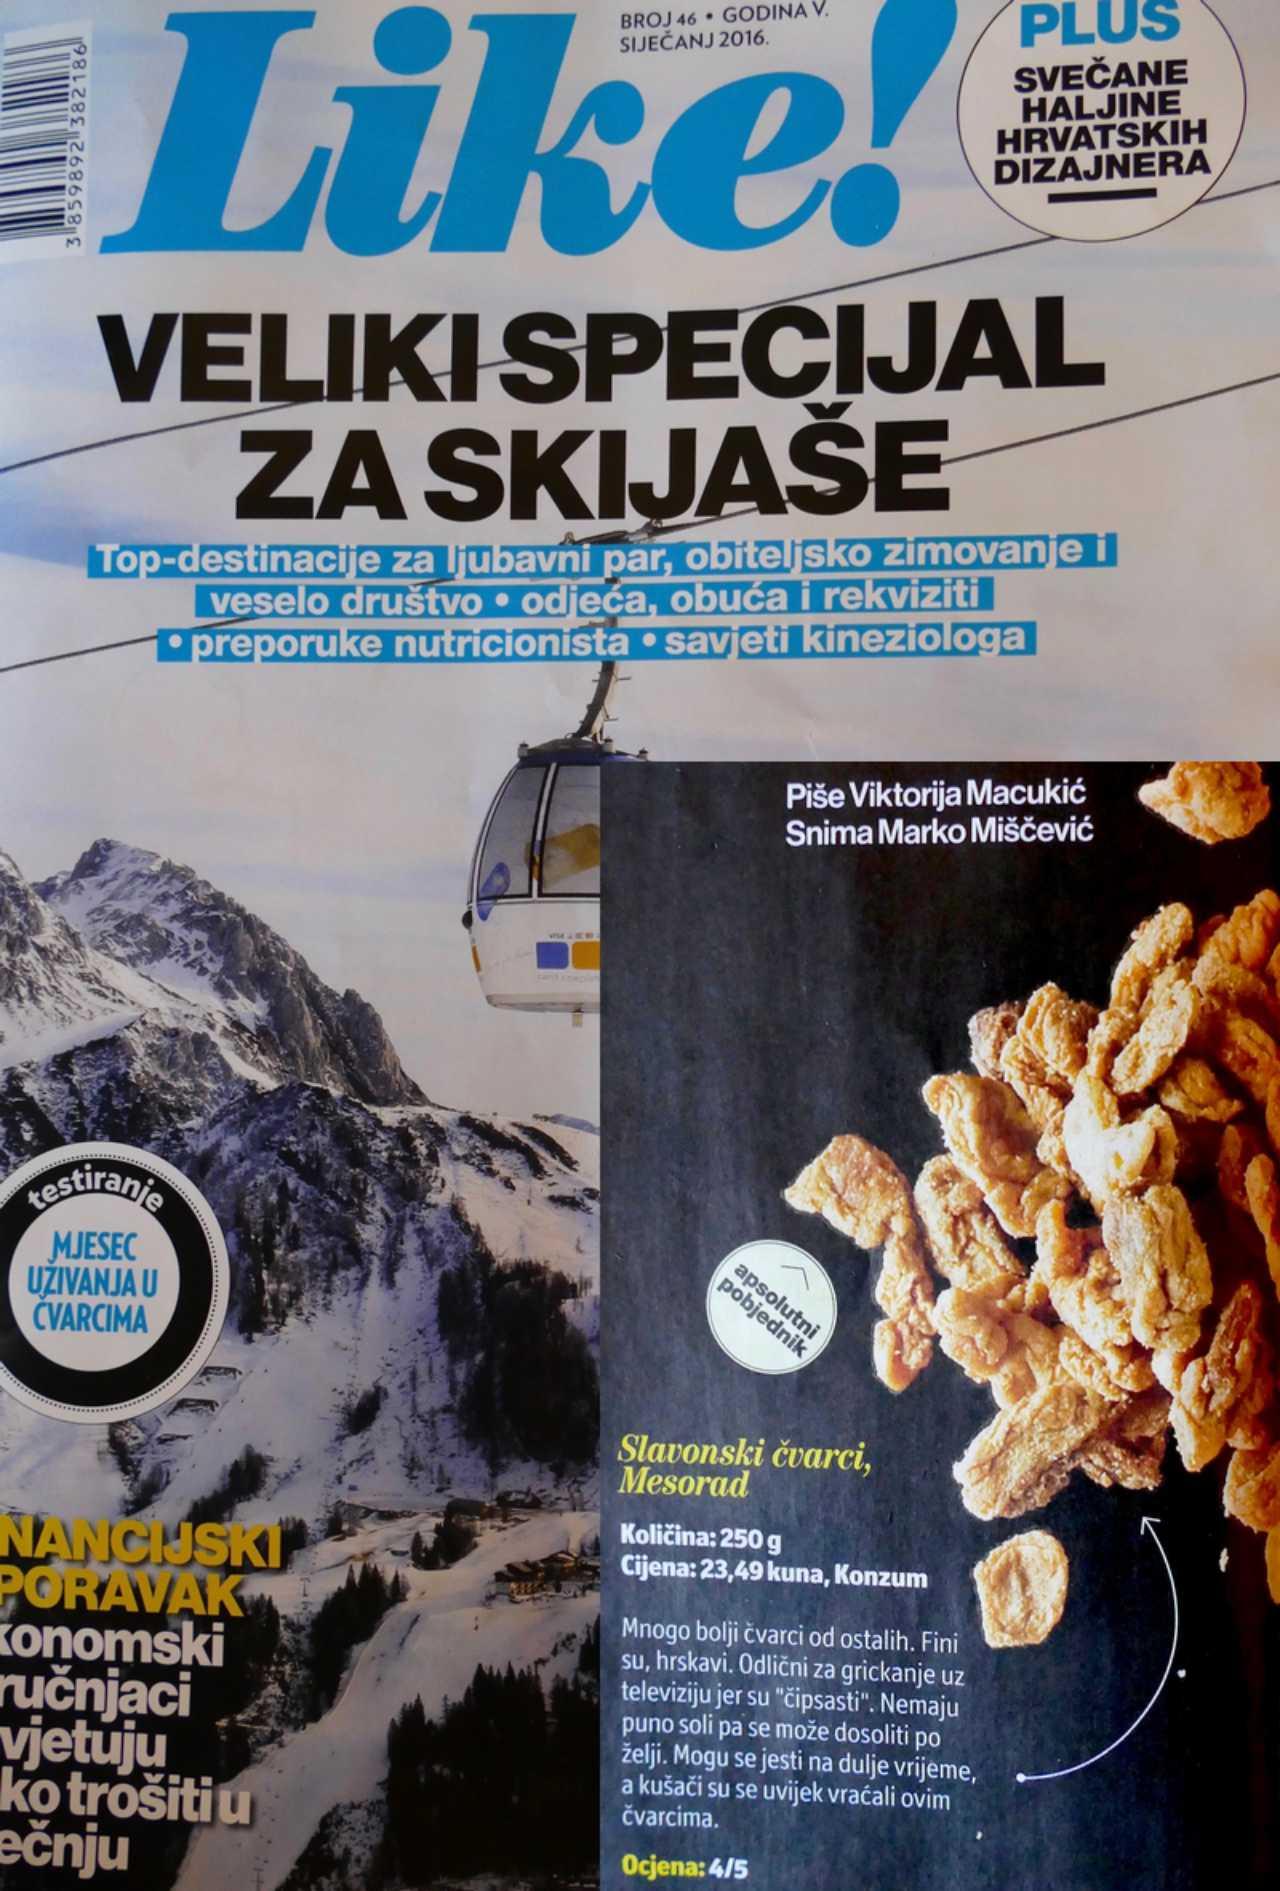 test-cvaraka-iz-marketa-2